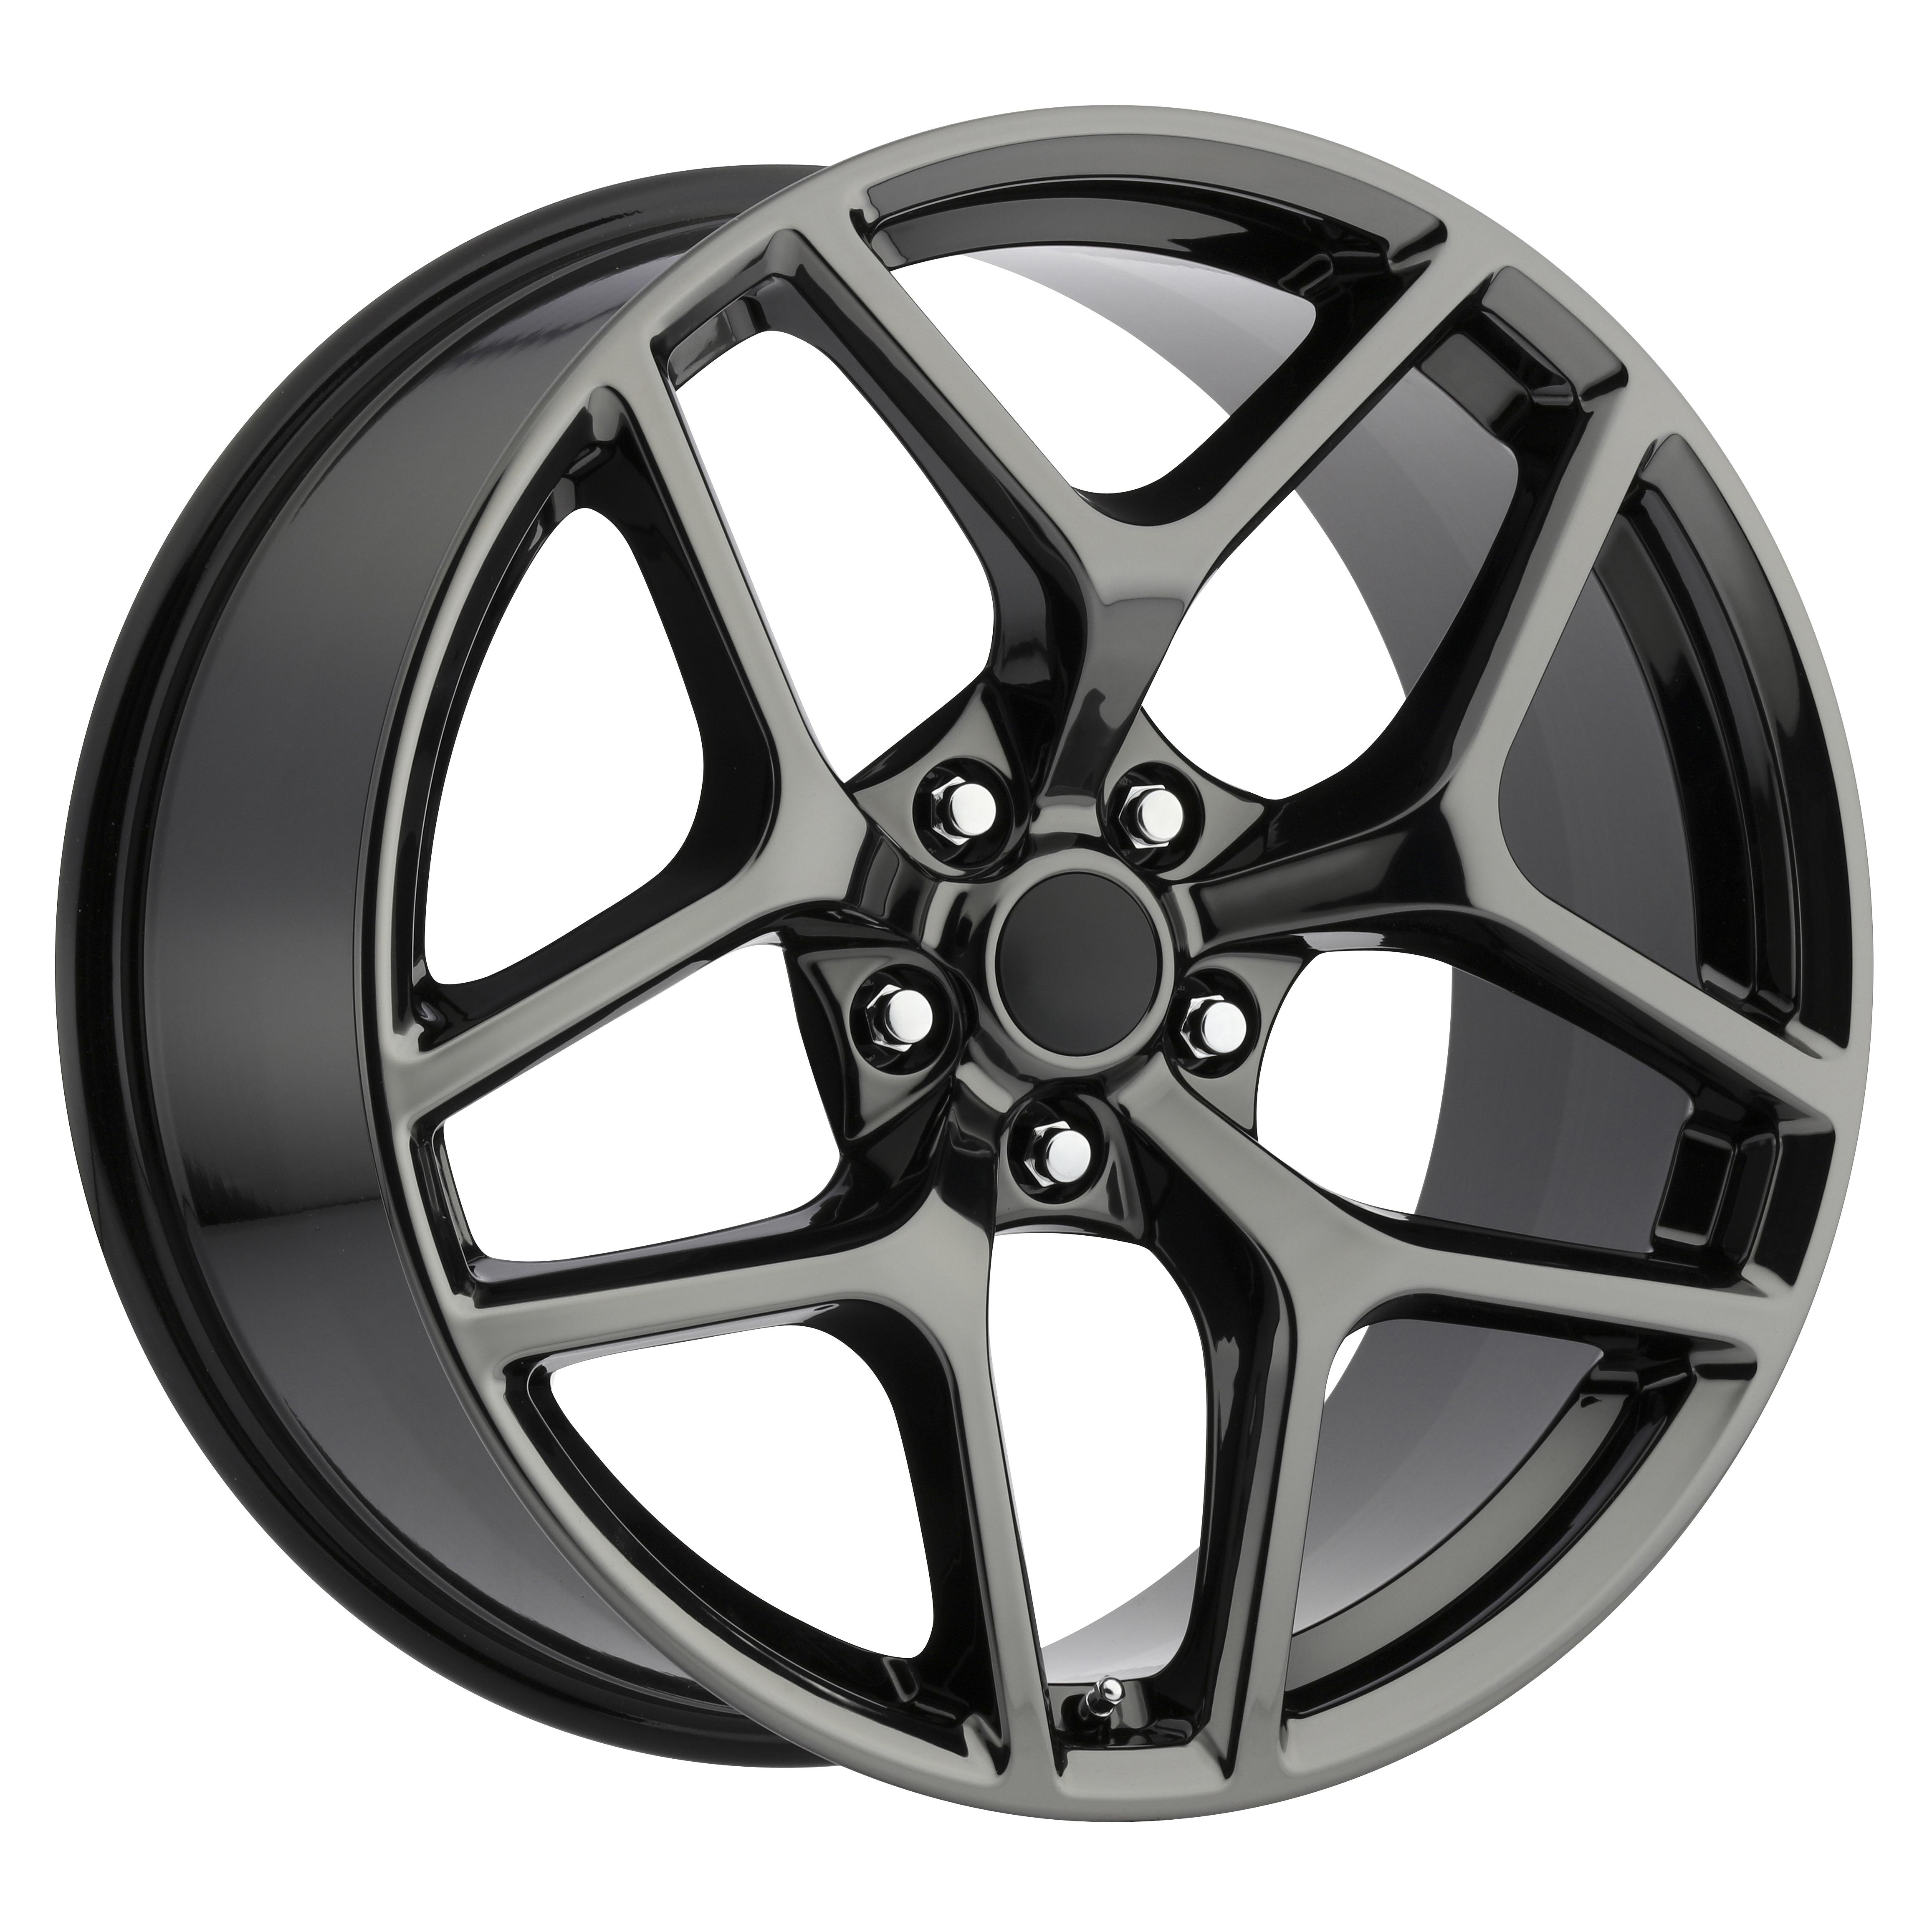 Chevrolet Camaro Z28 PVD Black Chrome Replicas